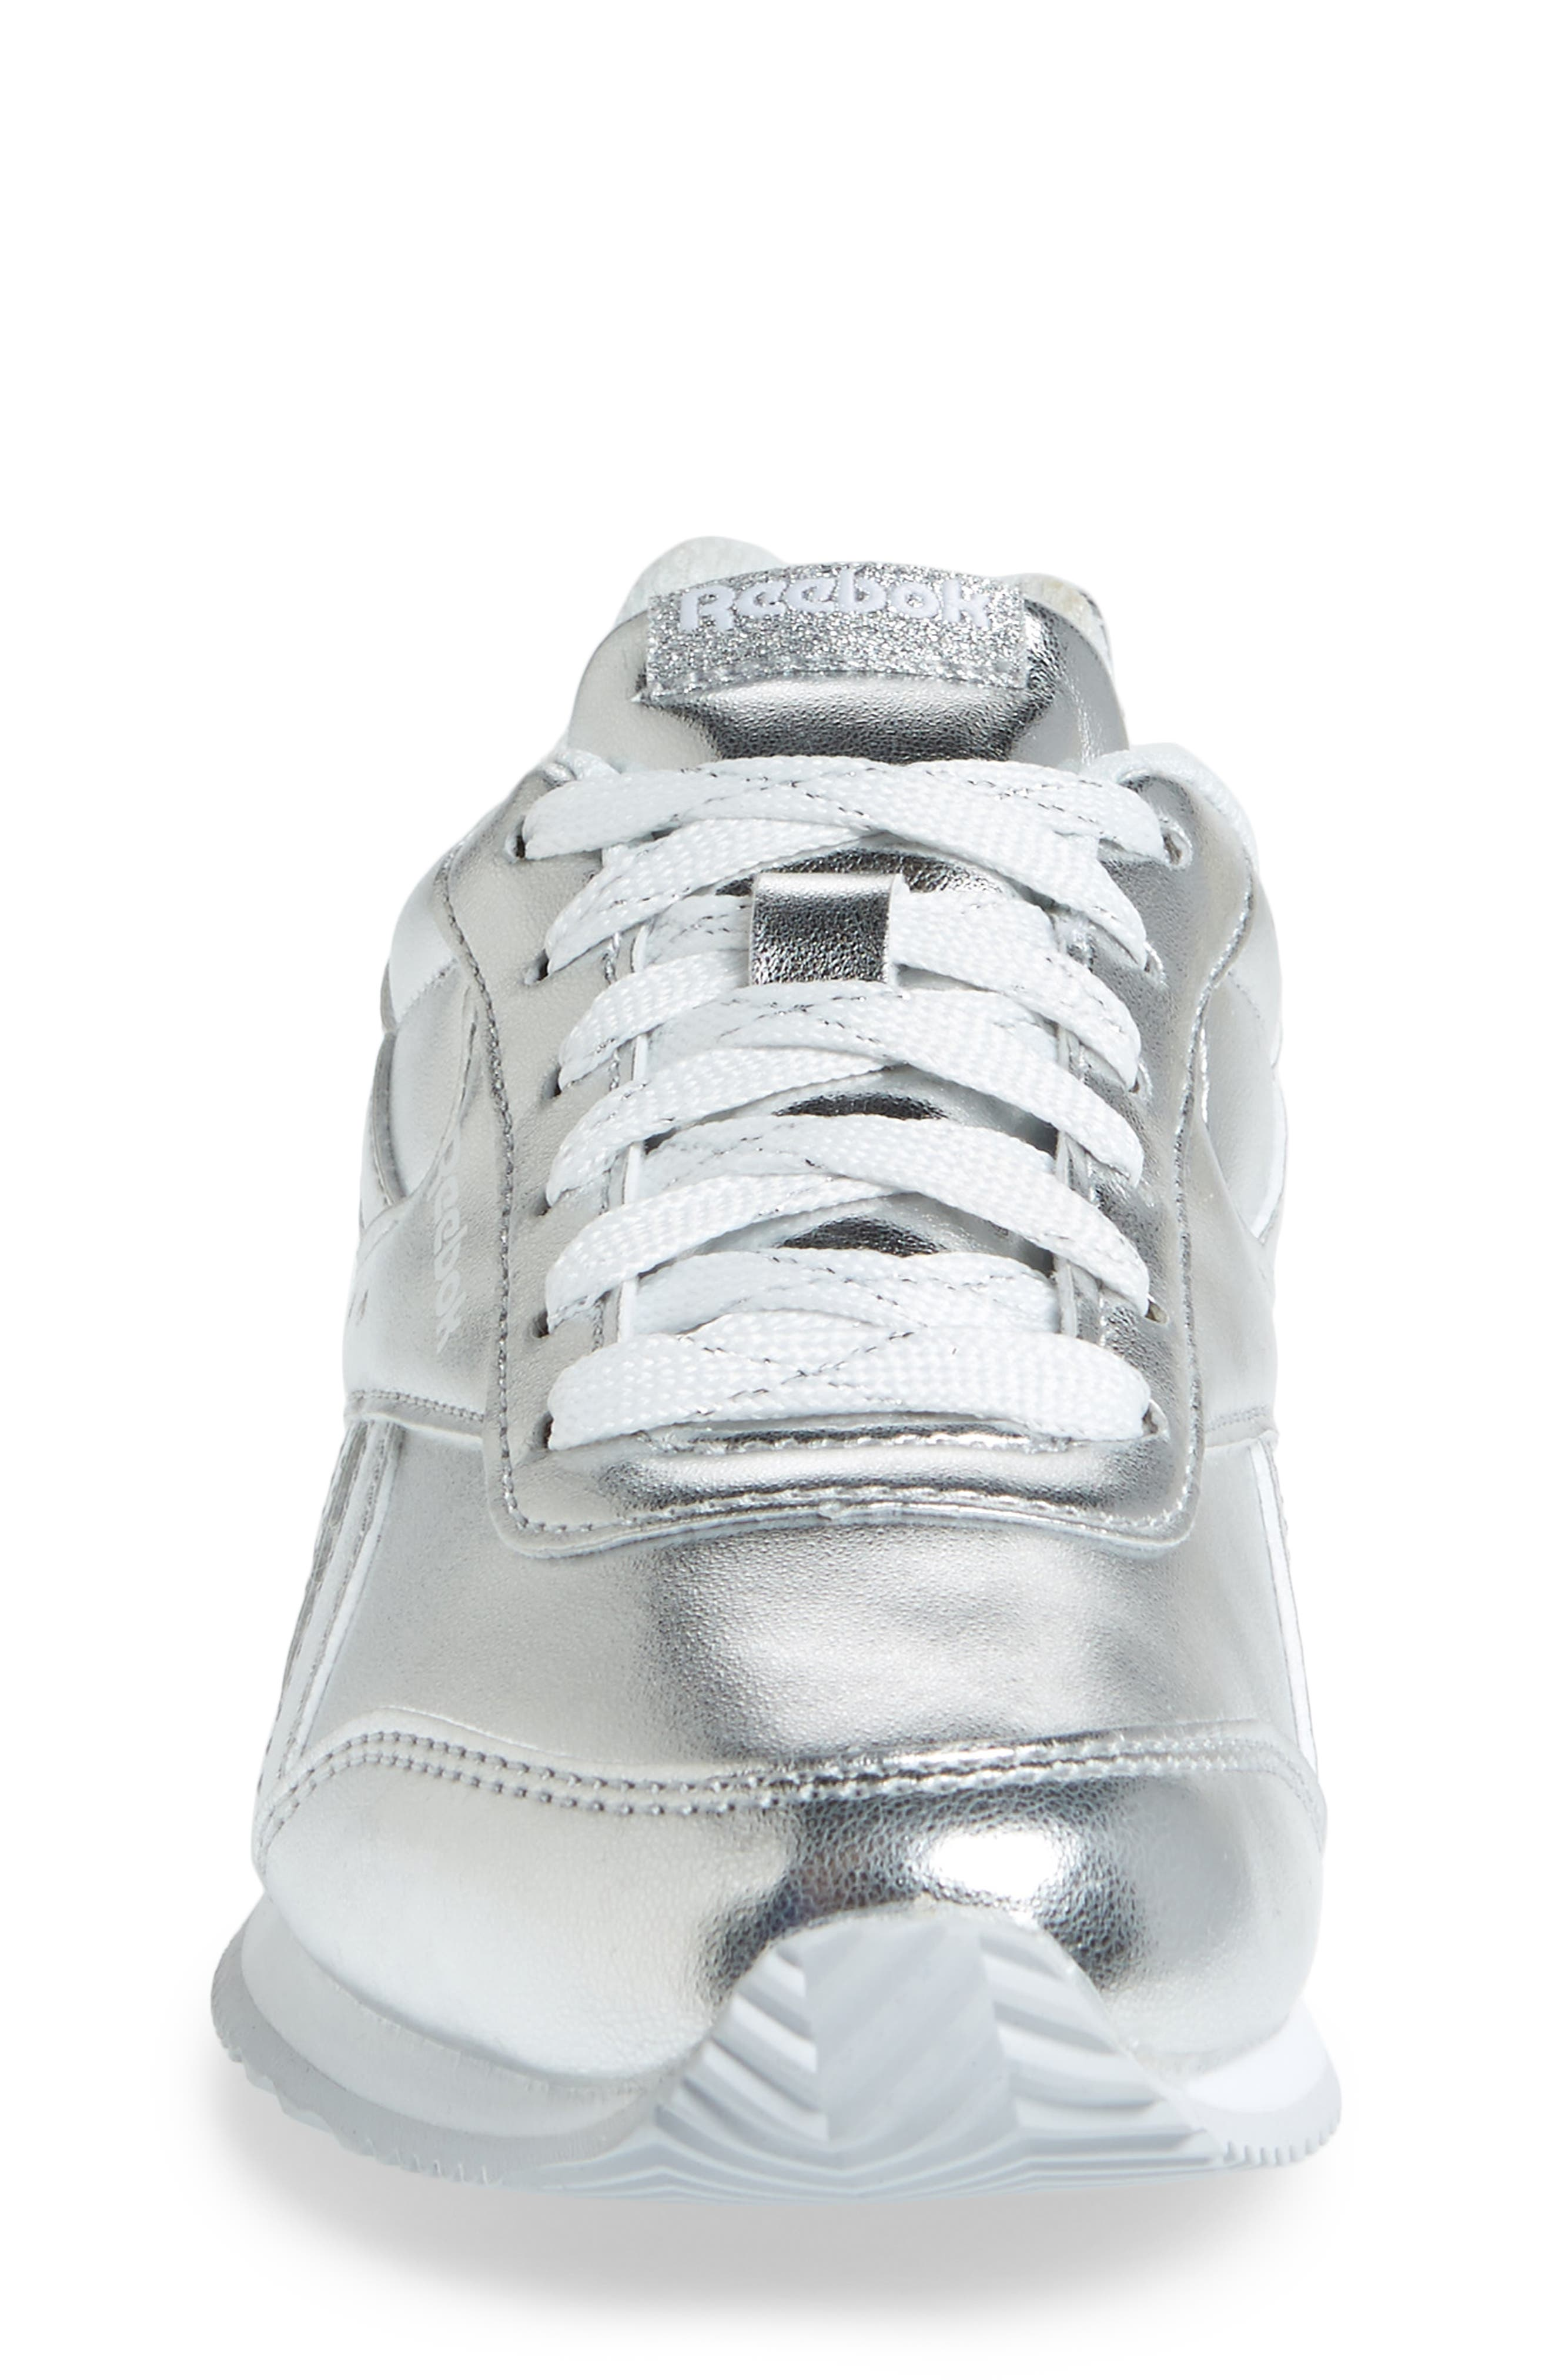 Royal Classic Jogger 2.0 Sneaker,                             Alternate thumbnail 4, color,                             Silver Metallic/ White